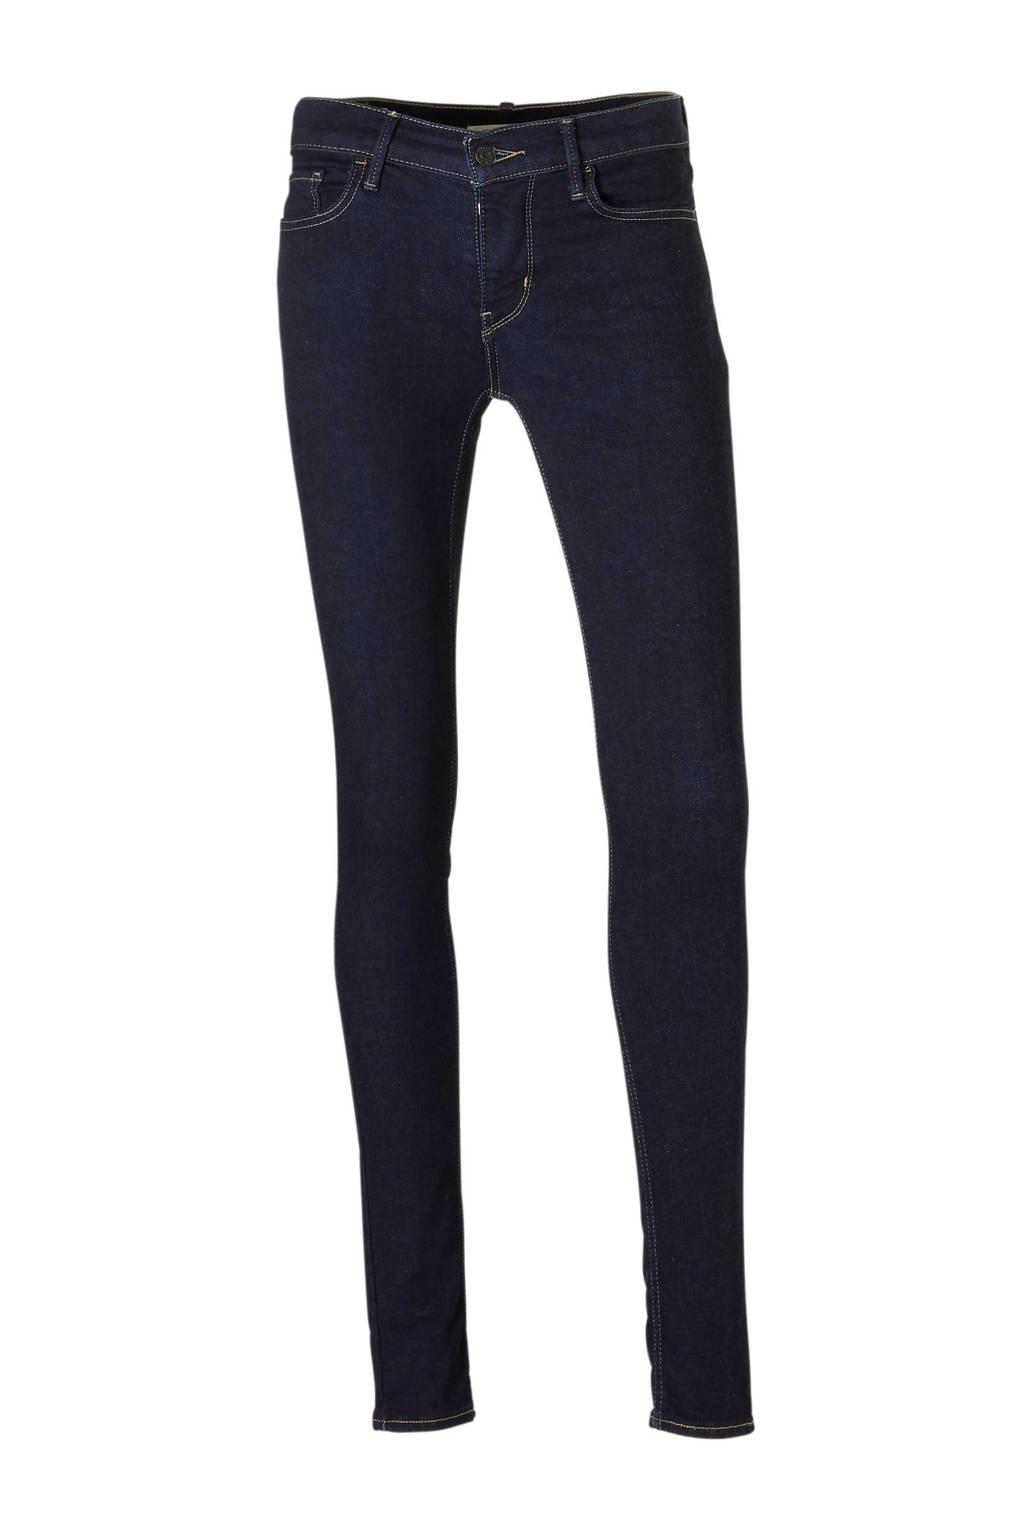 Levi's skinny jeans, Donkerblauw